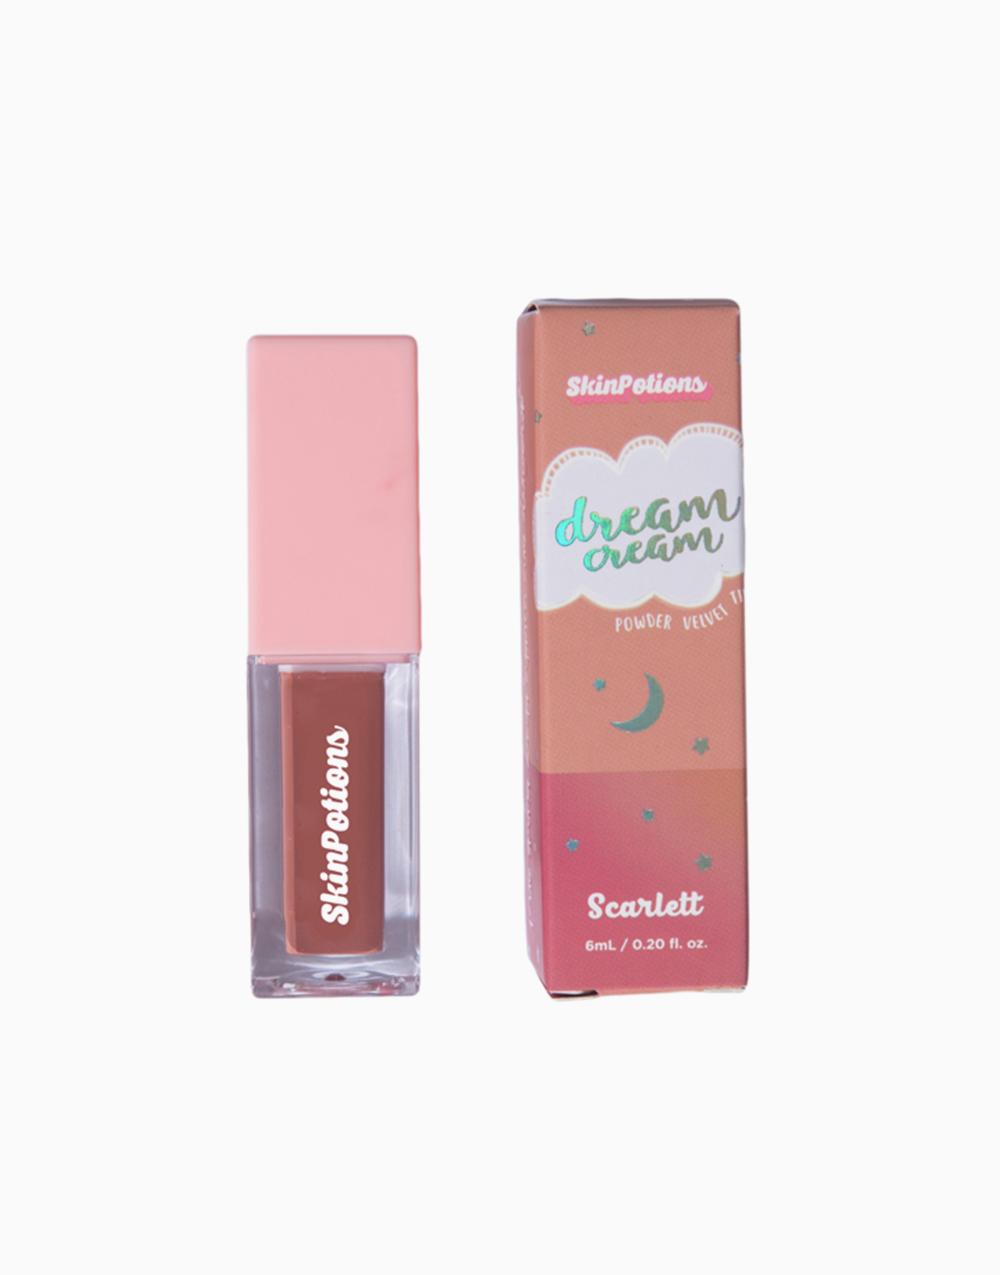 Dream Cream by Skinpotions | Scarlett